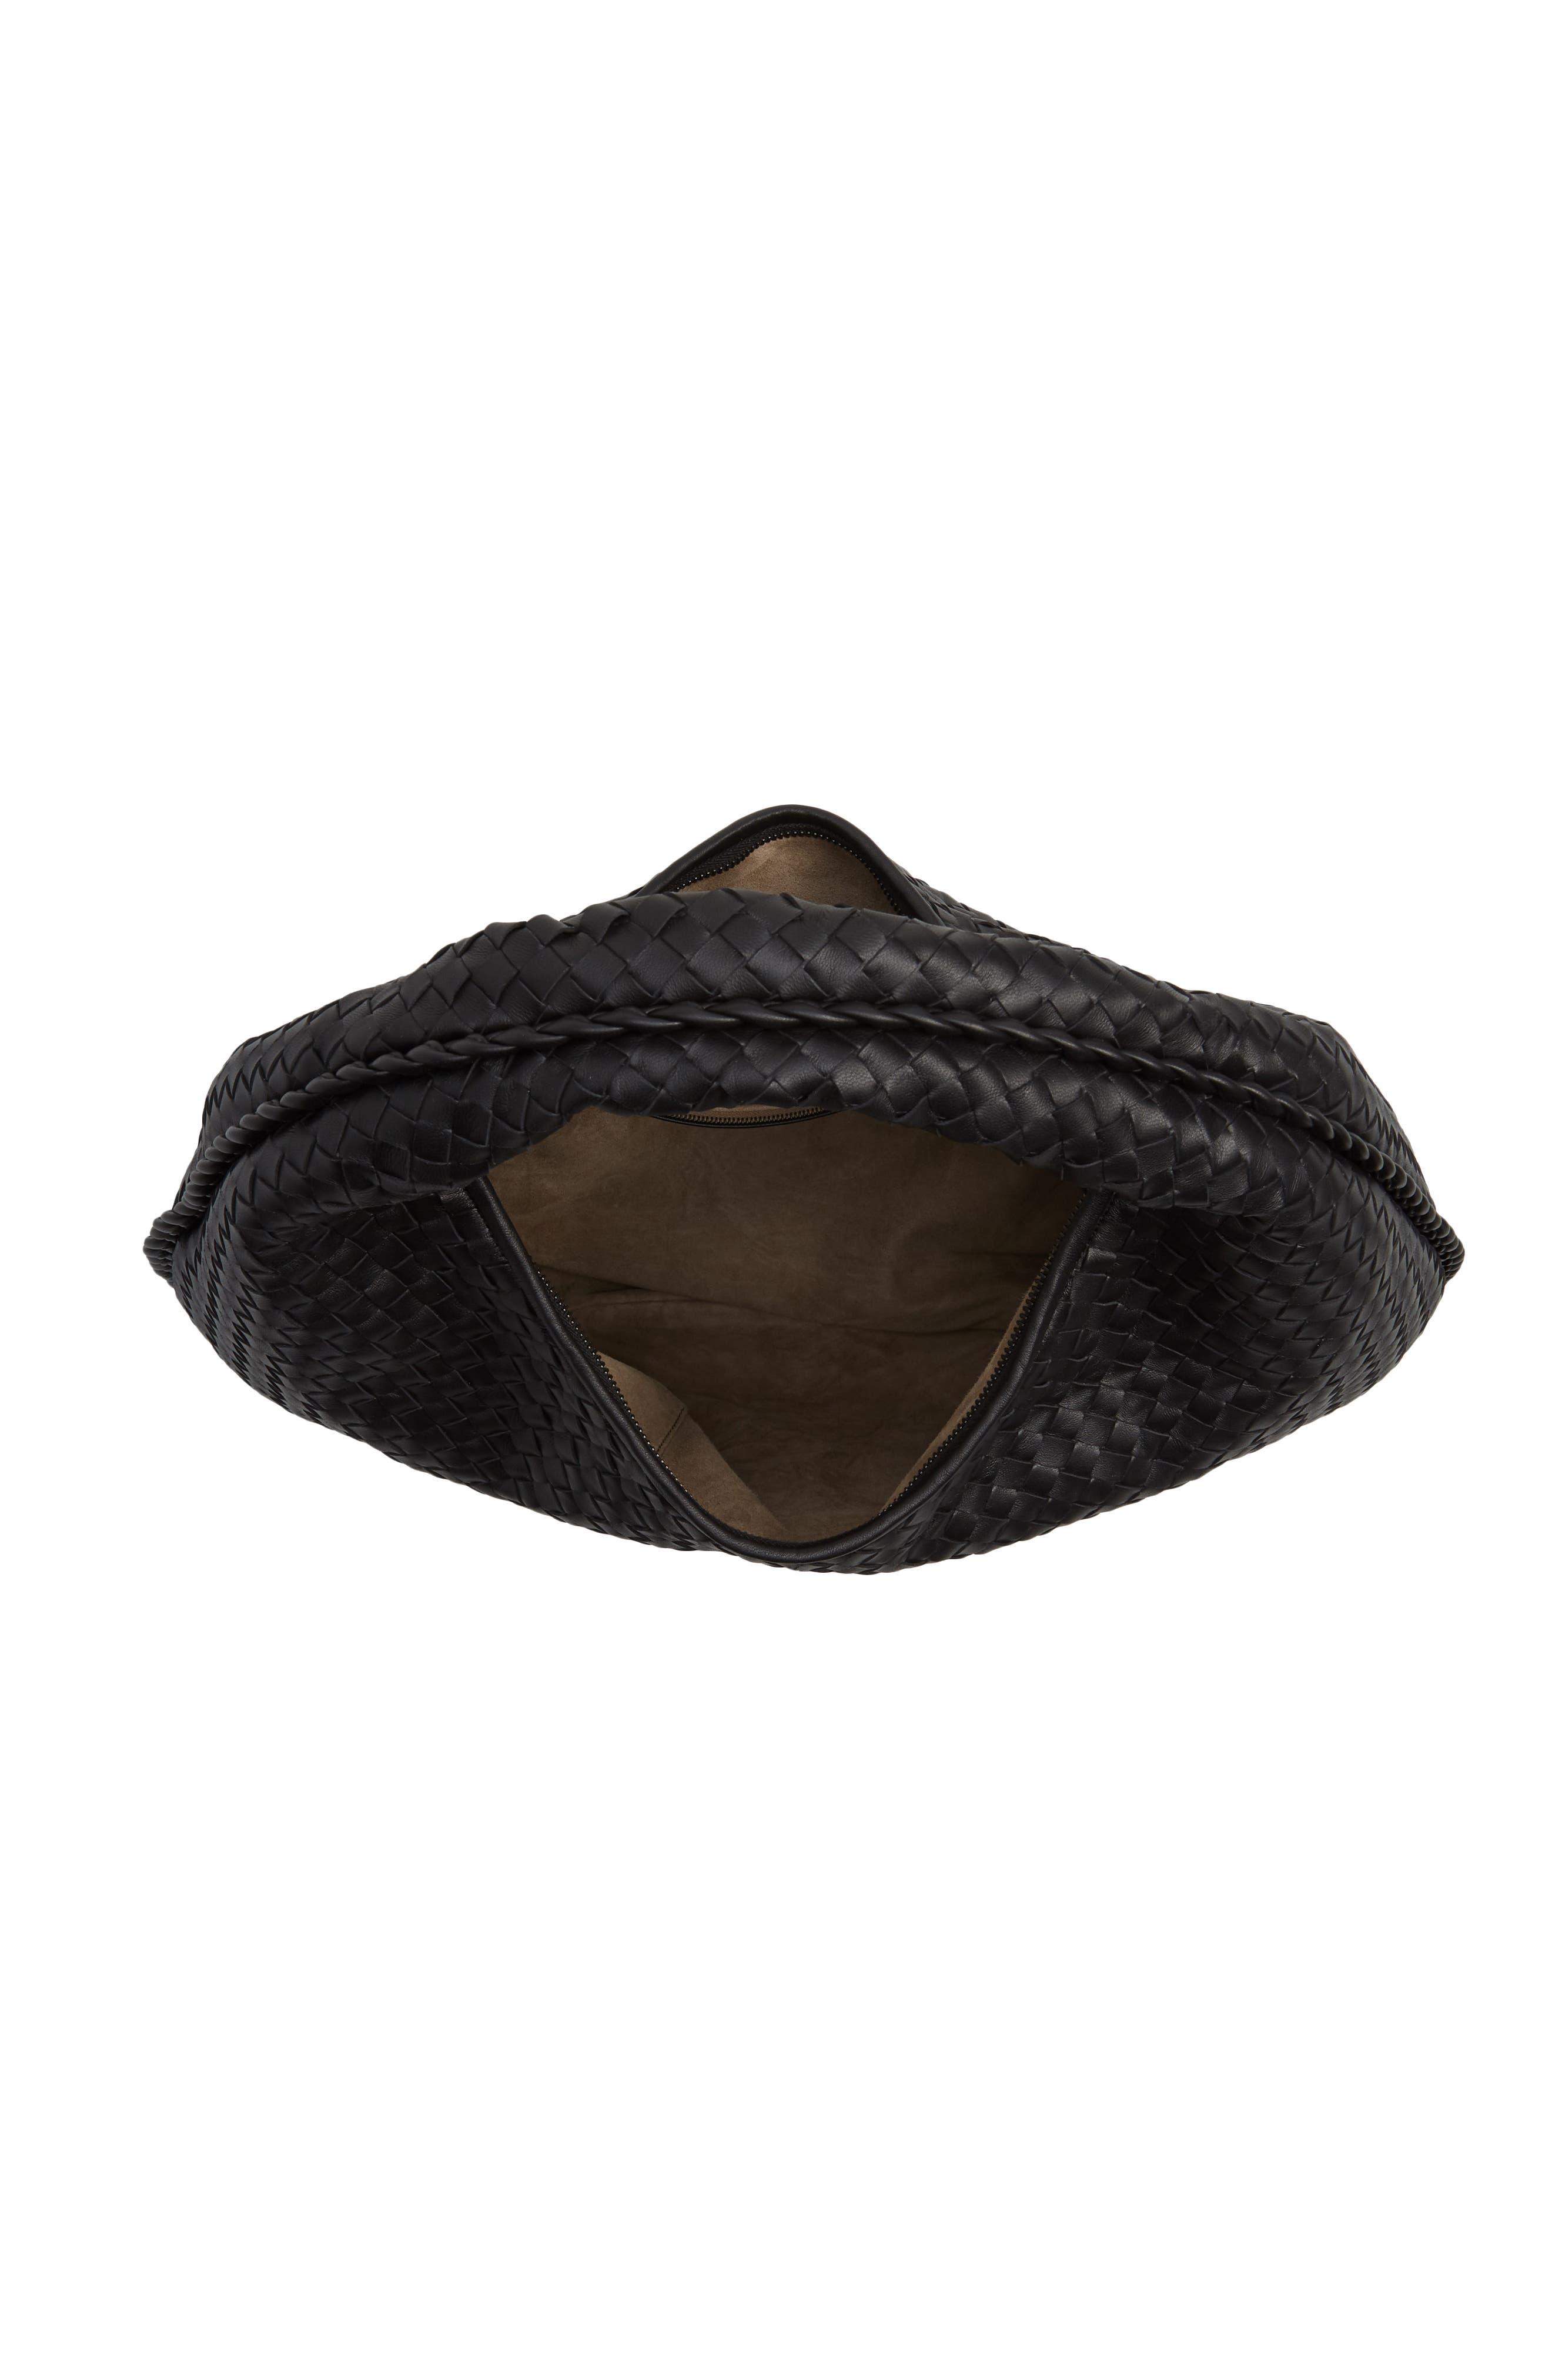 Large Veneta Leather Hobo,                             Alternate thumbnail 4, color,                             8175 NERO